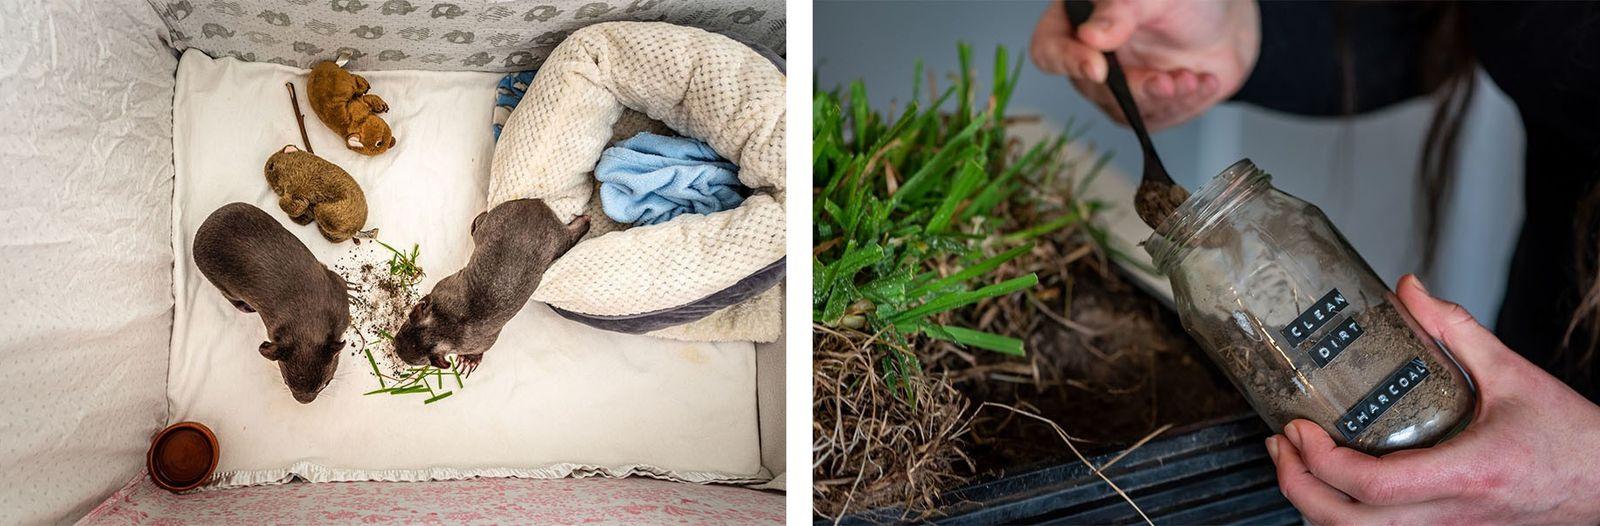 Esquerda: Landon e Bronson mascam ervas que Emily colocou no seu cercado. Emily vai cuidar dos ...